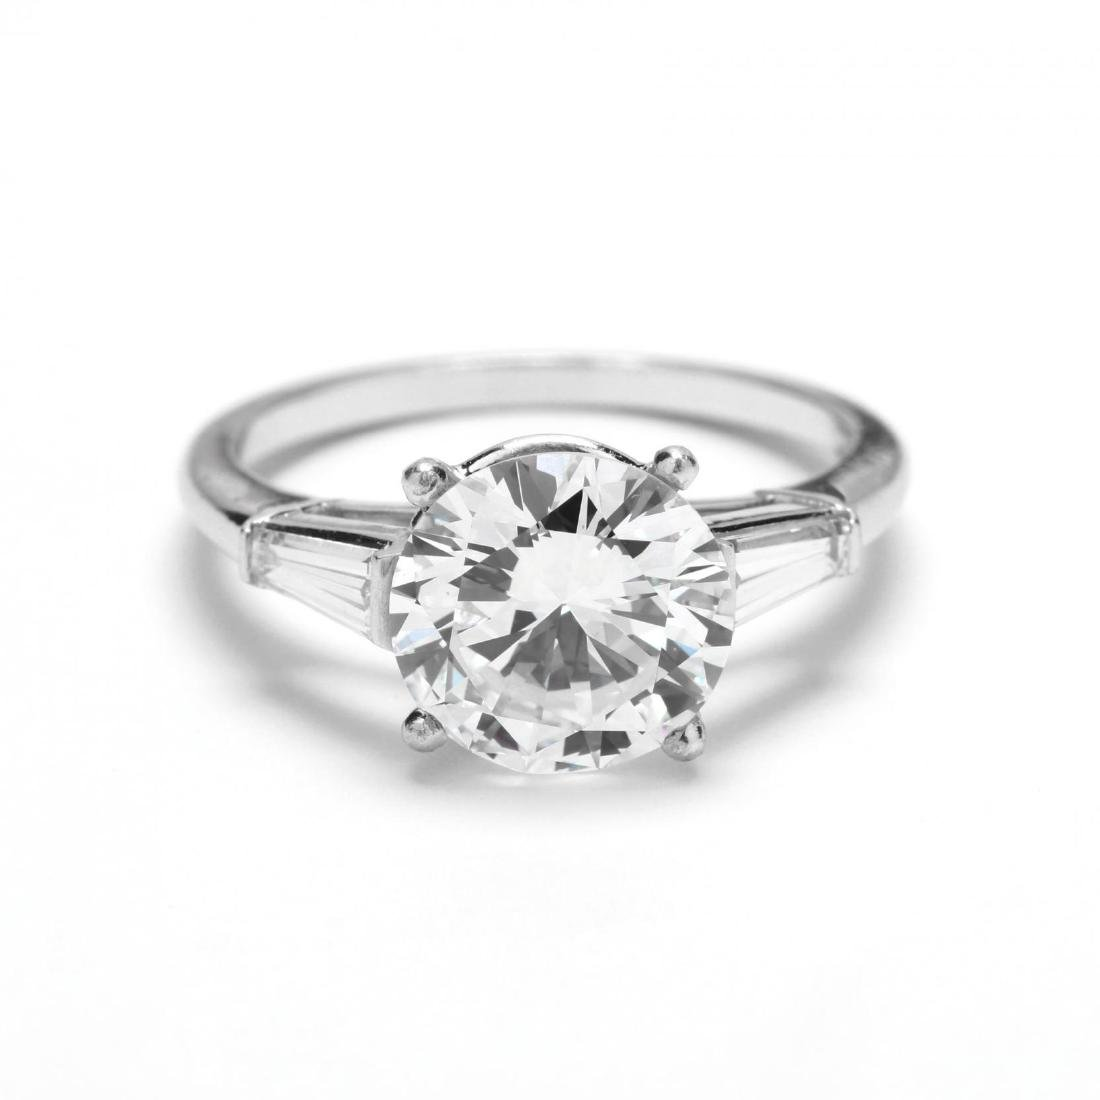 Unmounted Round Brilliant Cut Diamond with Platinum and